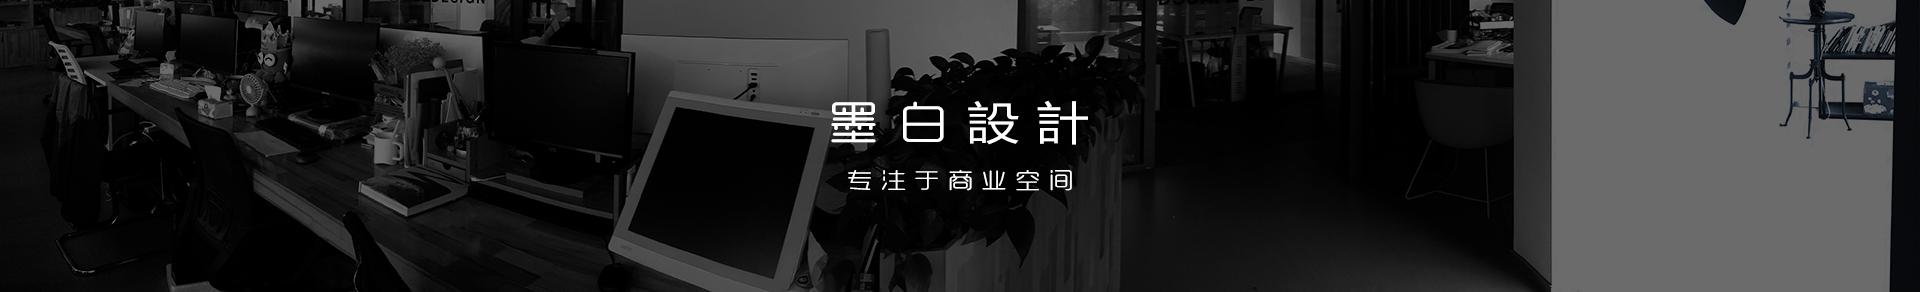 http://www.szmobai.cn/data/upload/201912/20191218163111_268.jpg